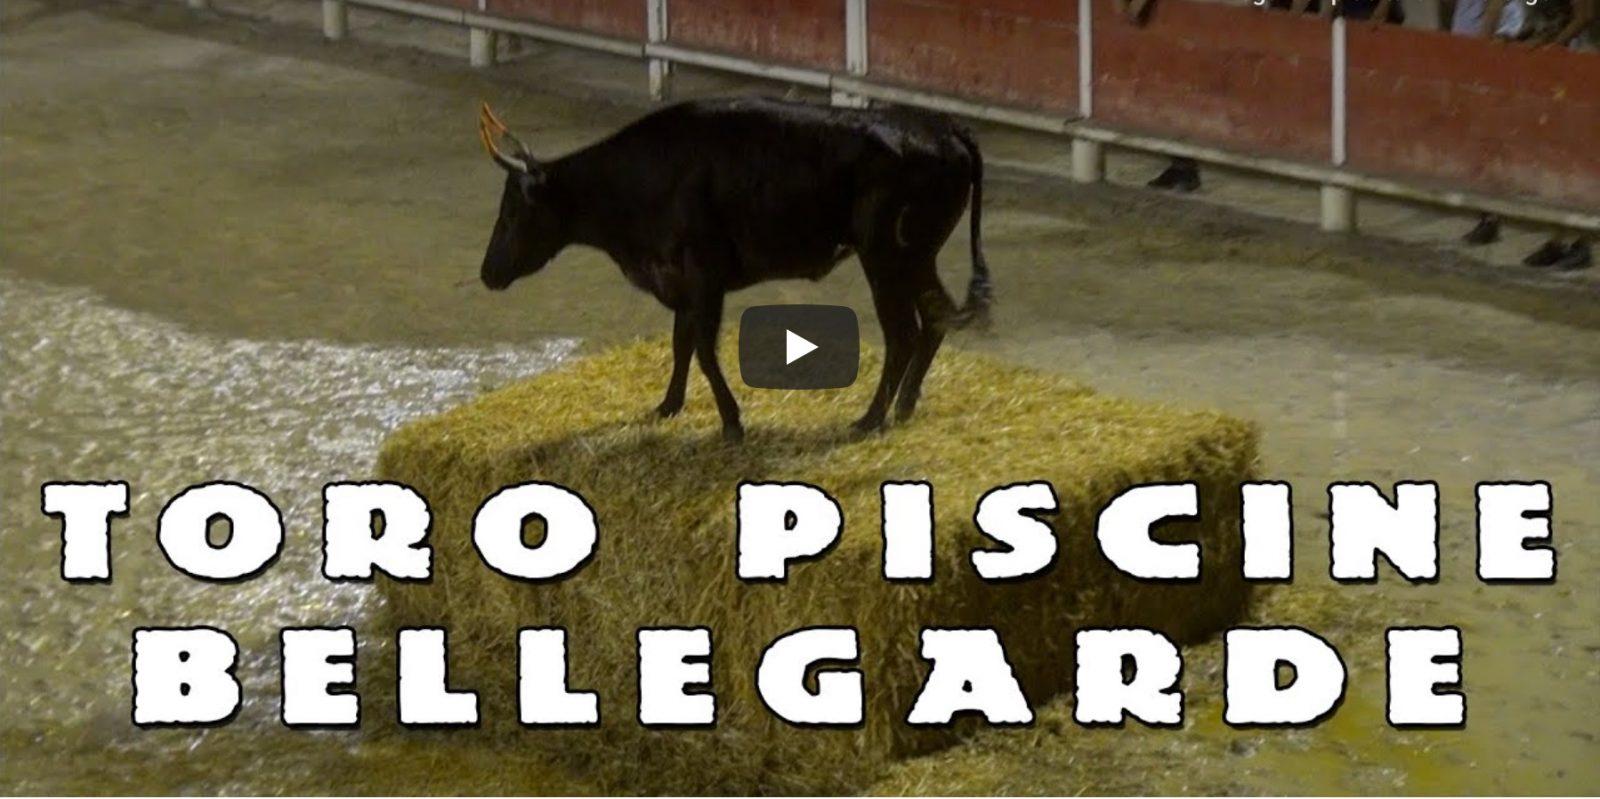 BELLEGARDE Toro Piscine 03-07-2019